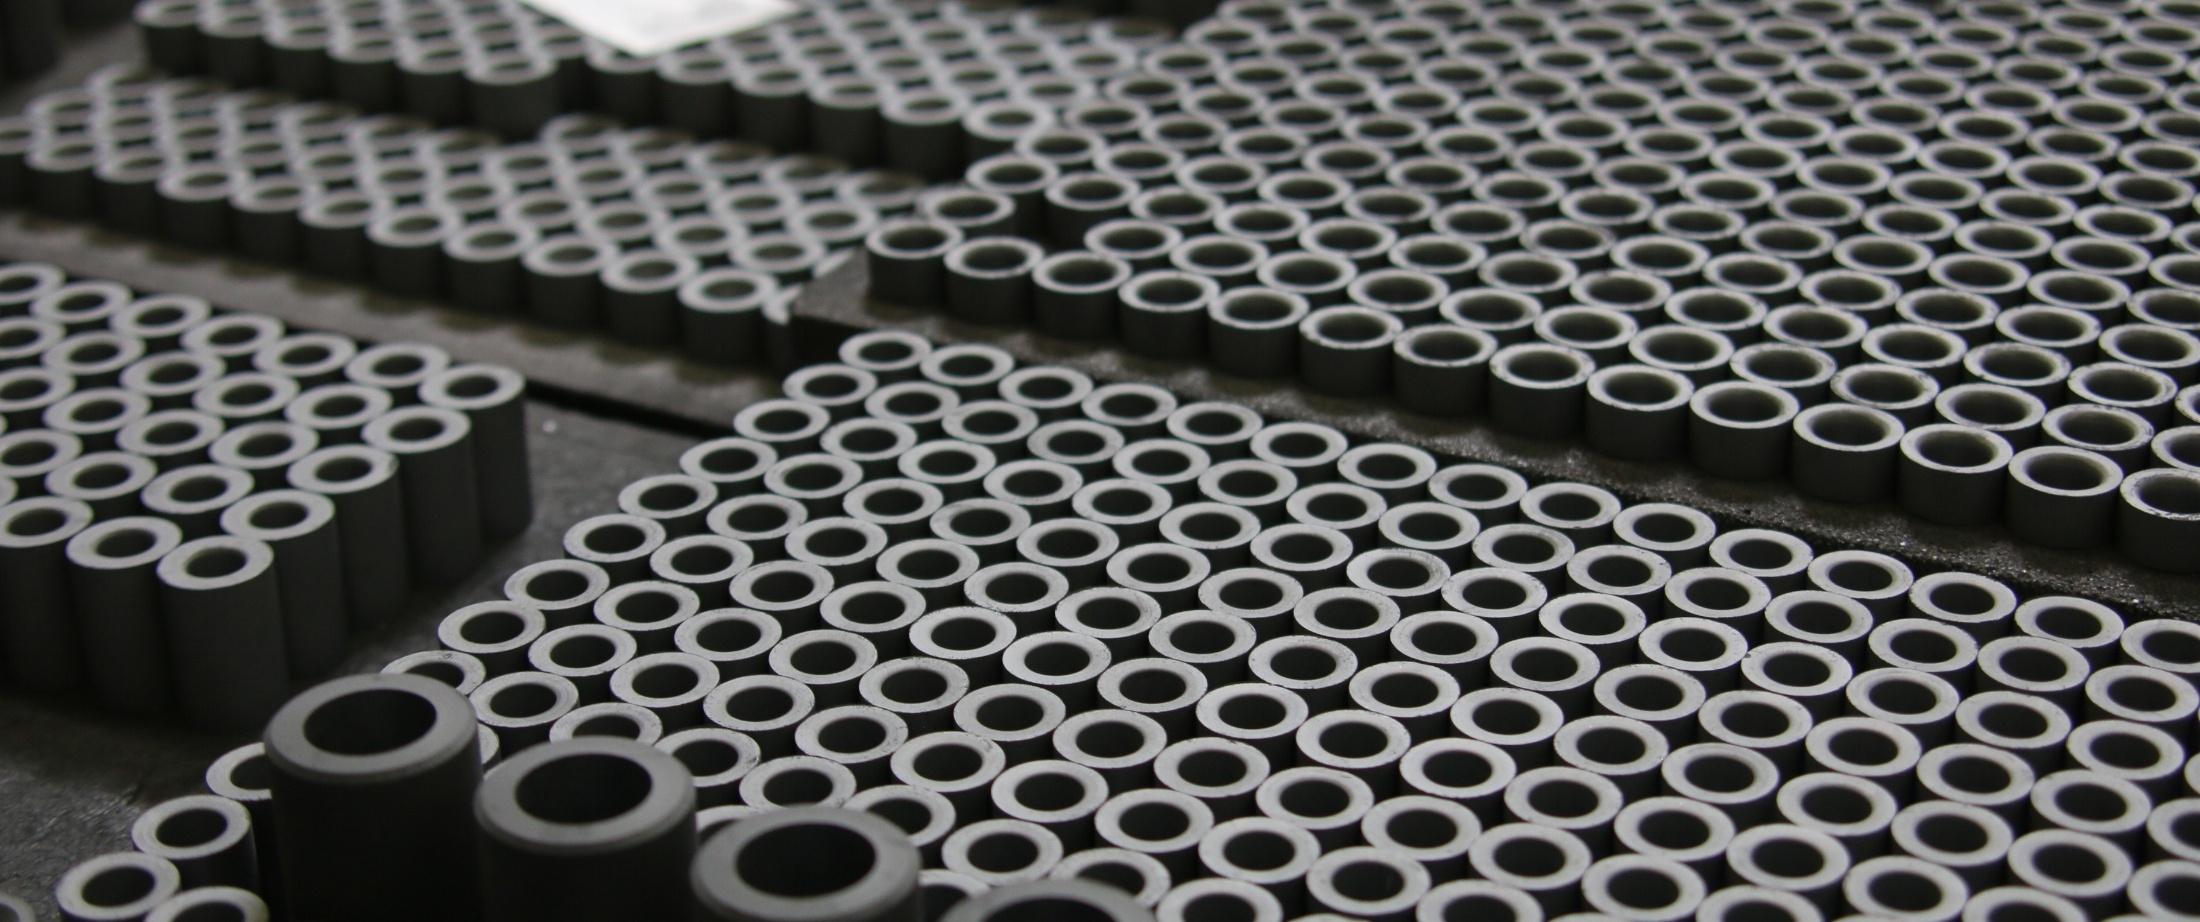 Contact a precision carbide manufacturer near you